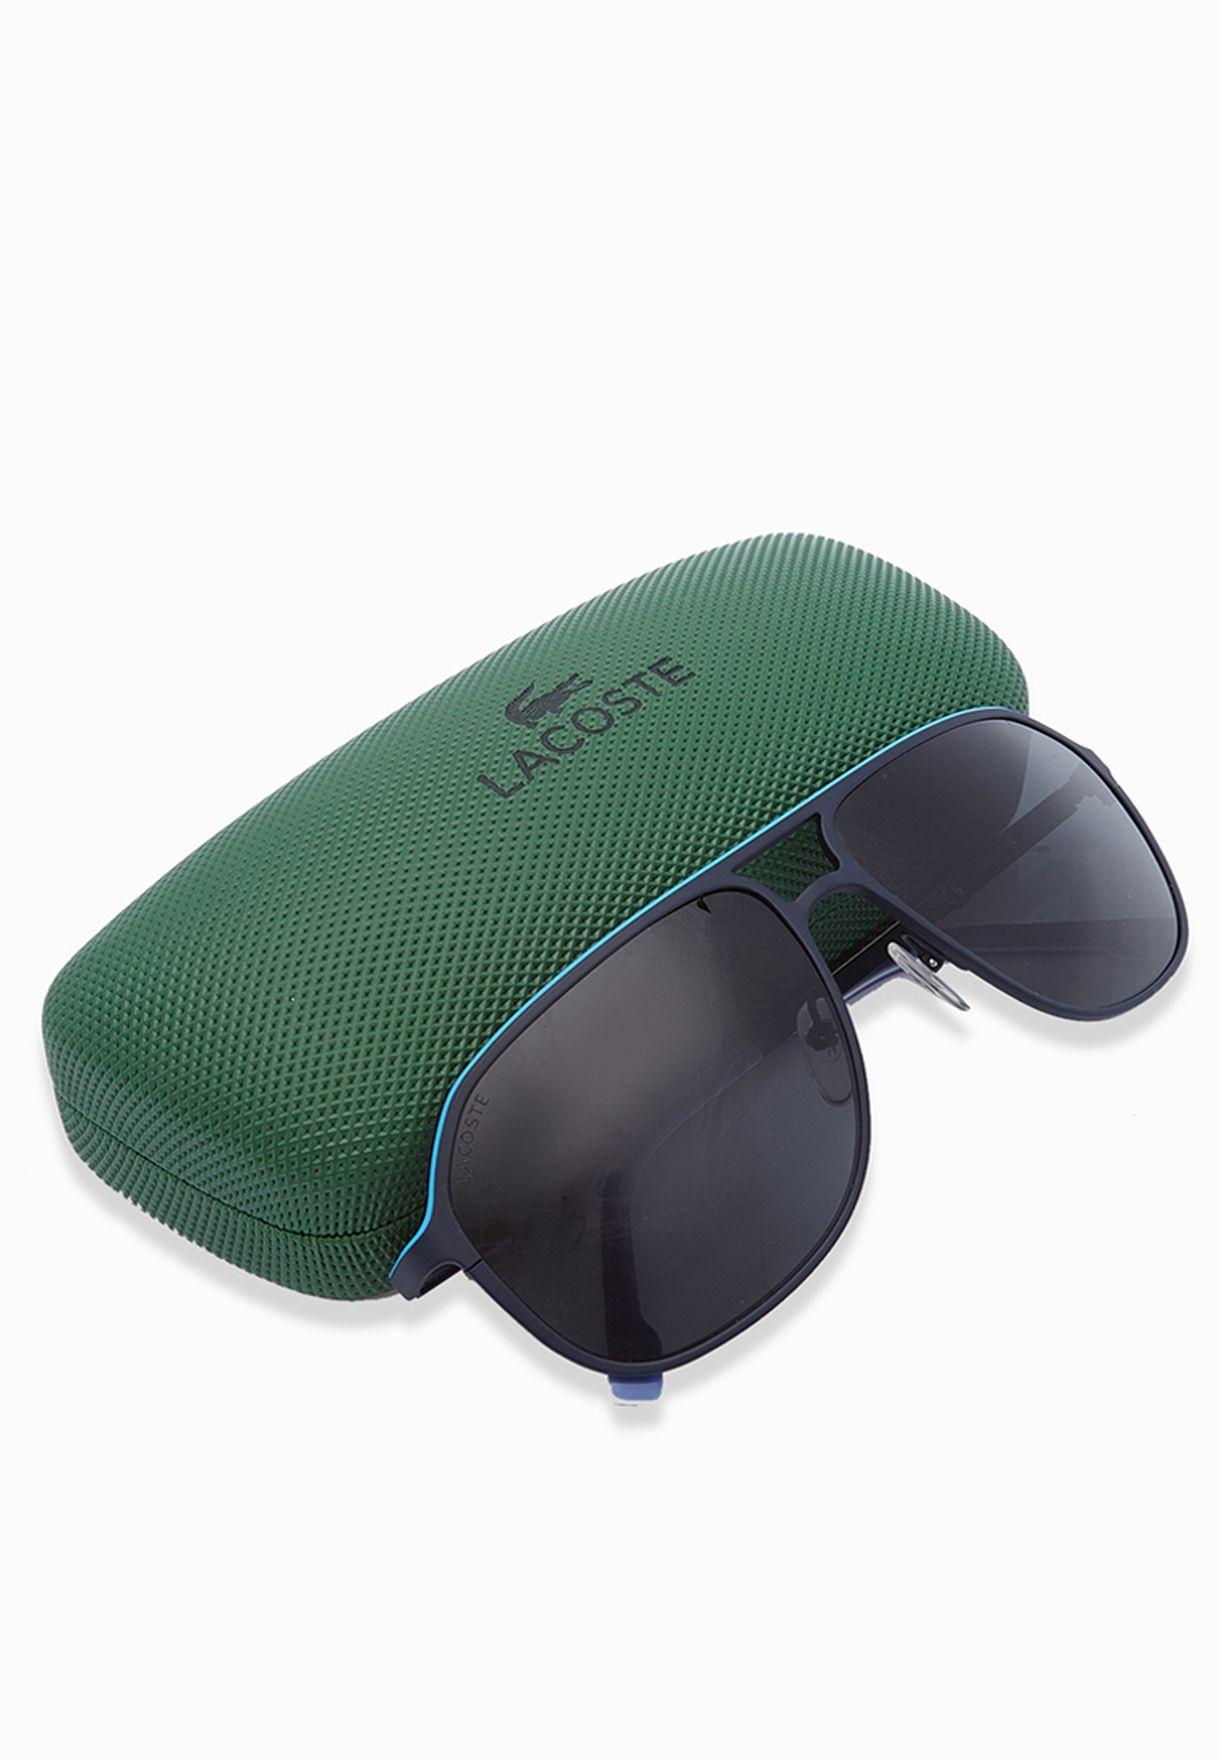 571d1d2c5 تسوق نظارة شسية افياتور ماركة لاكوست لون أسود L139SP-424 في البحرين ...